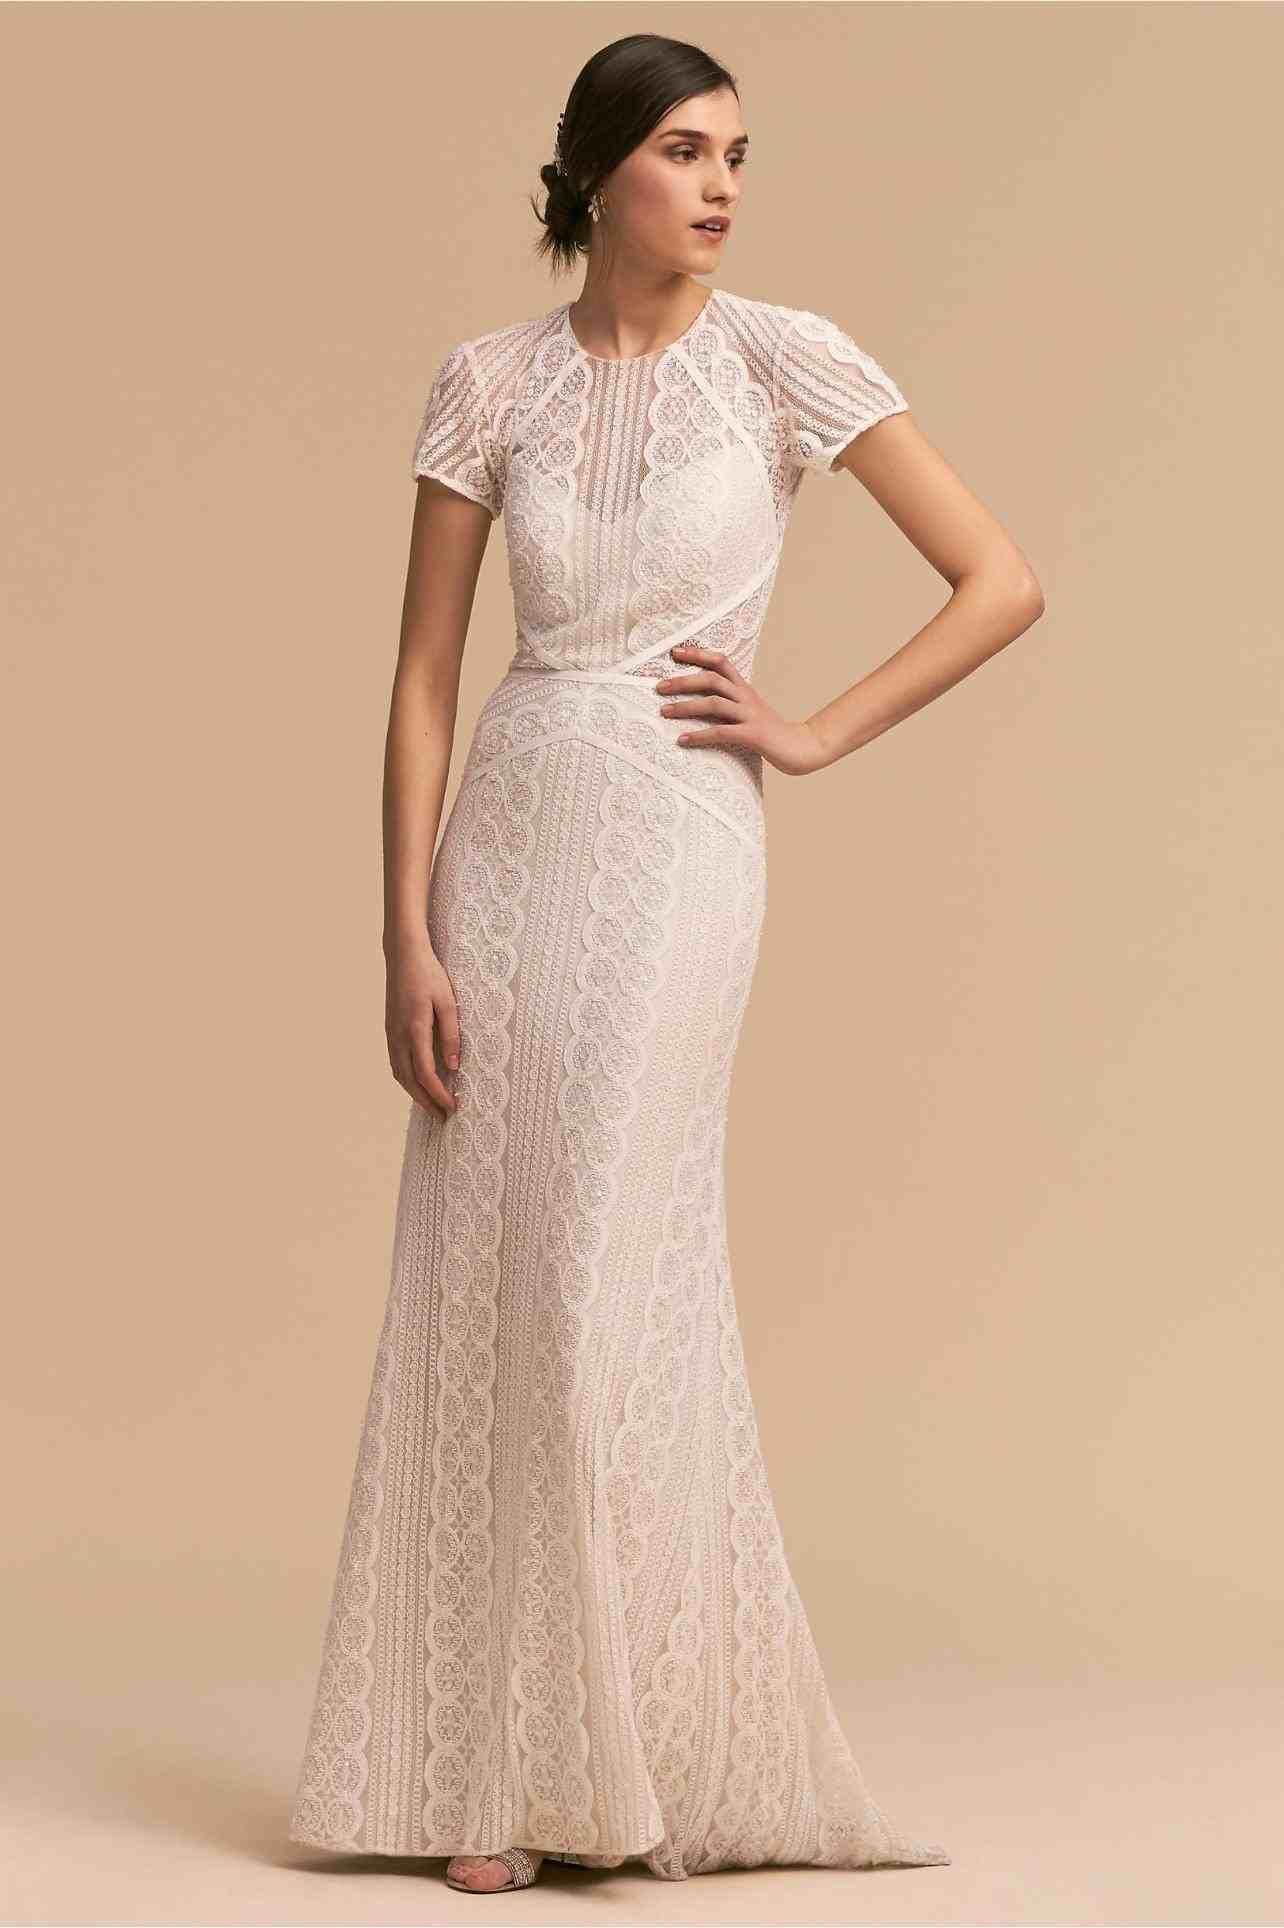 Vintage wedding dresses usus weddings pinterest